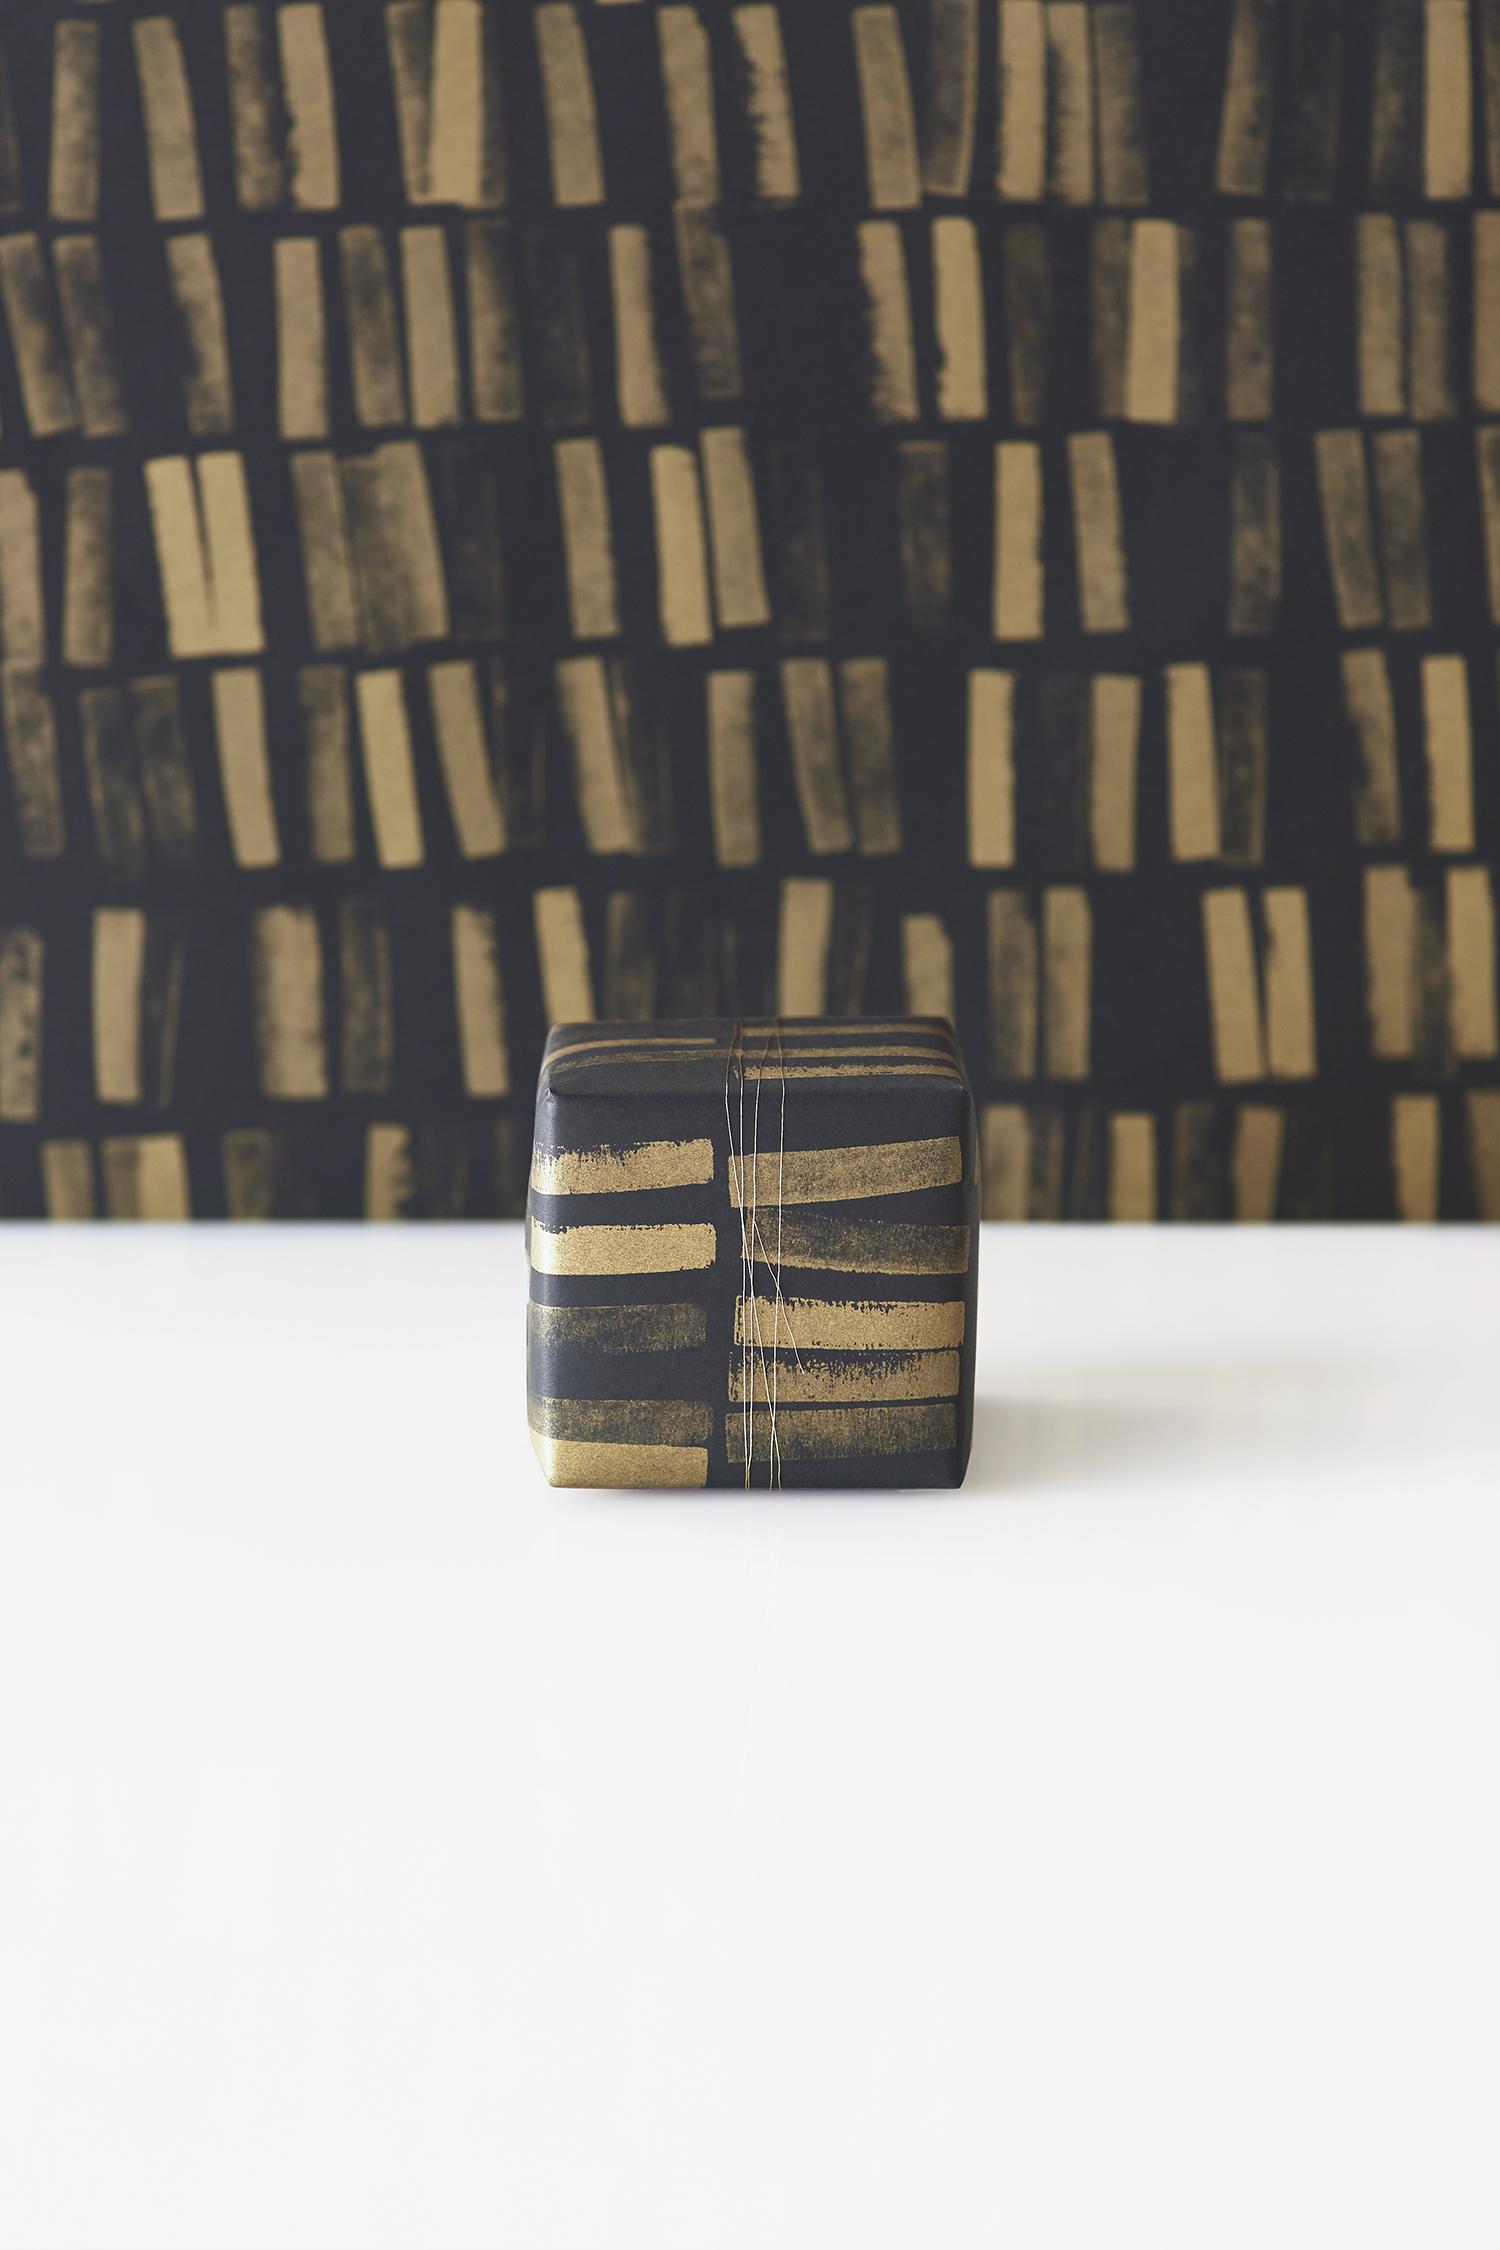 Studio of Christine Wisnieski   Gift Wrap